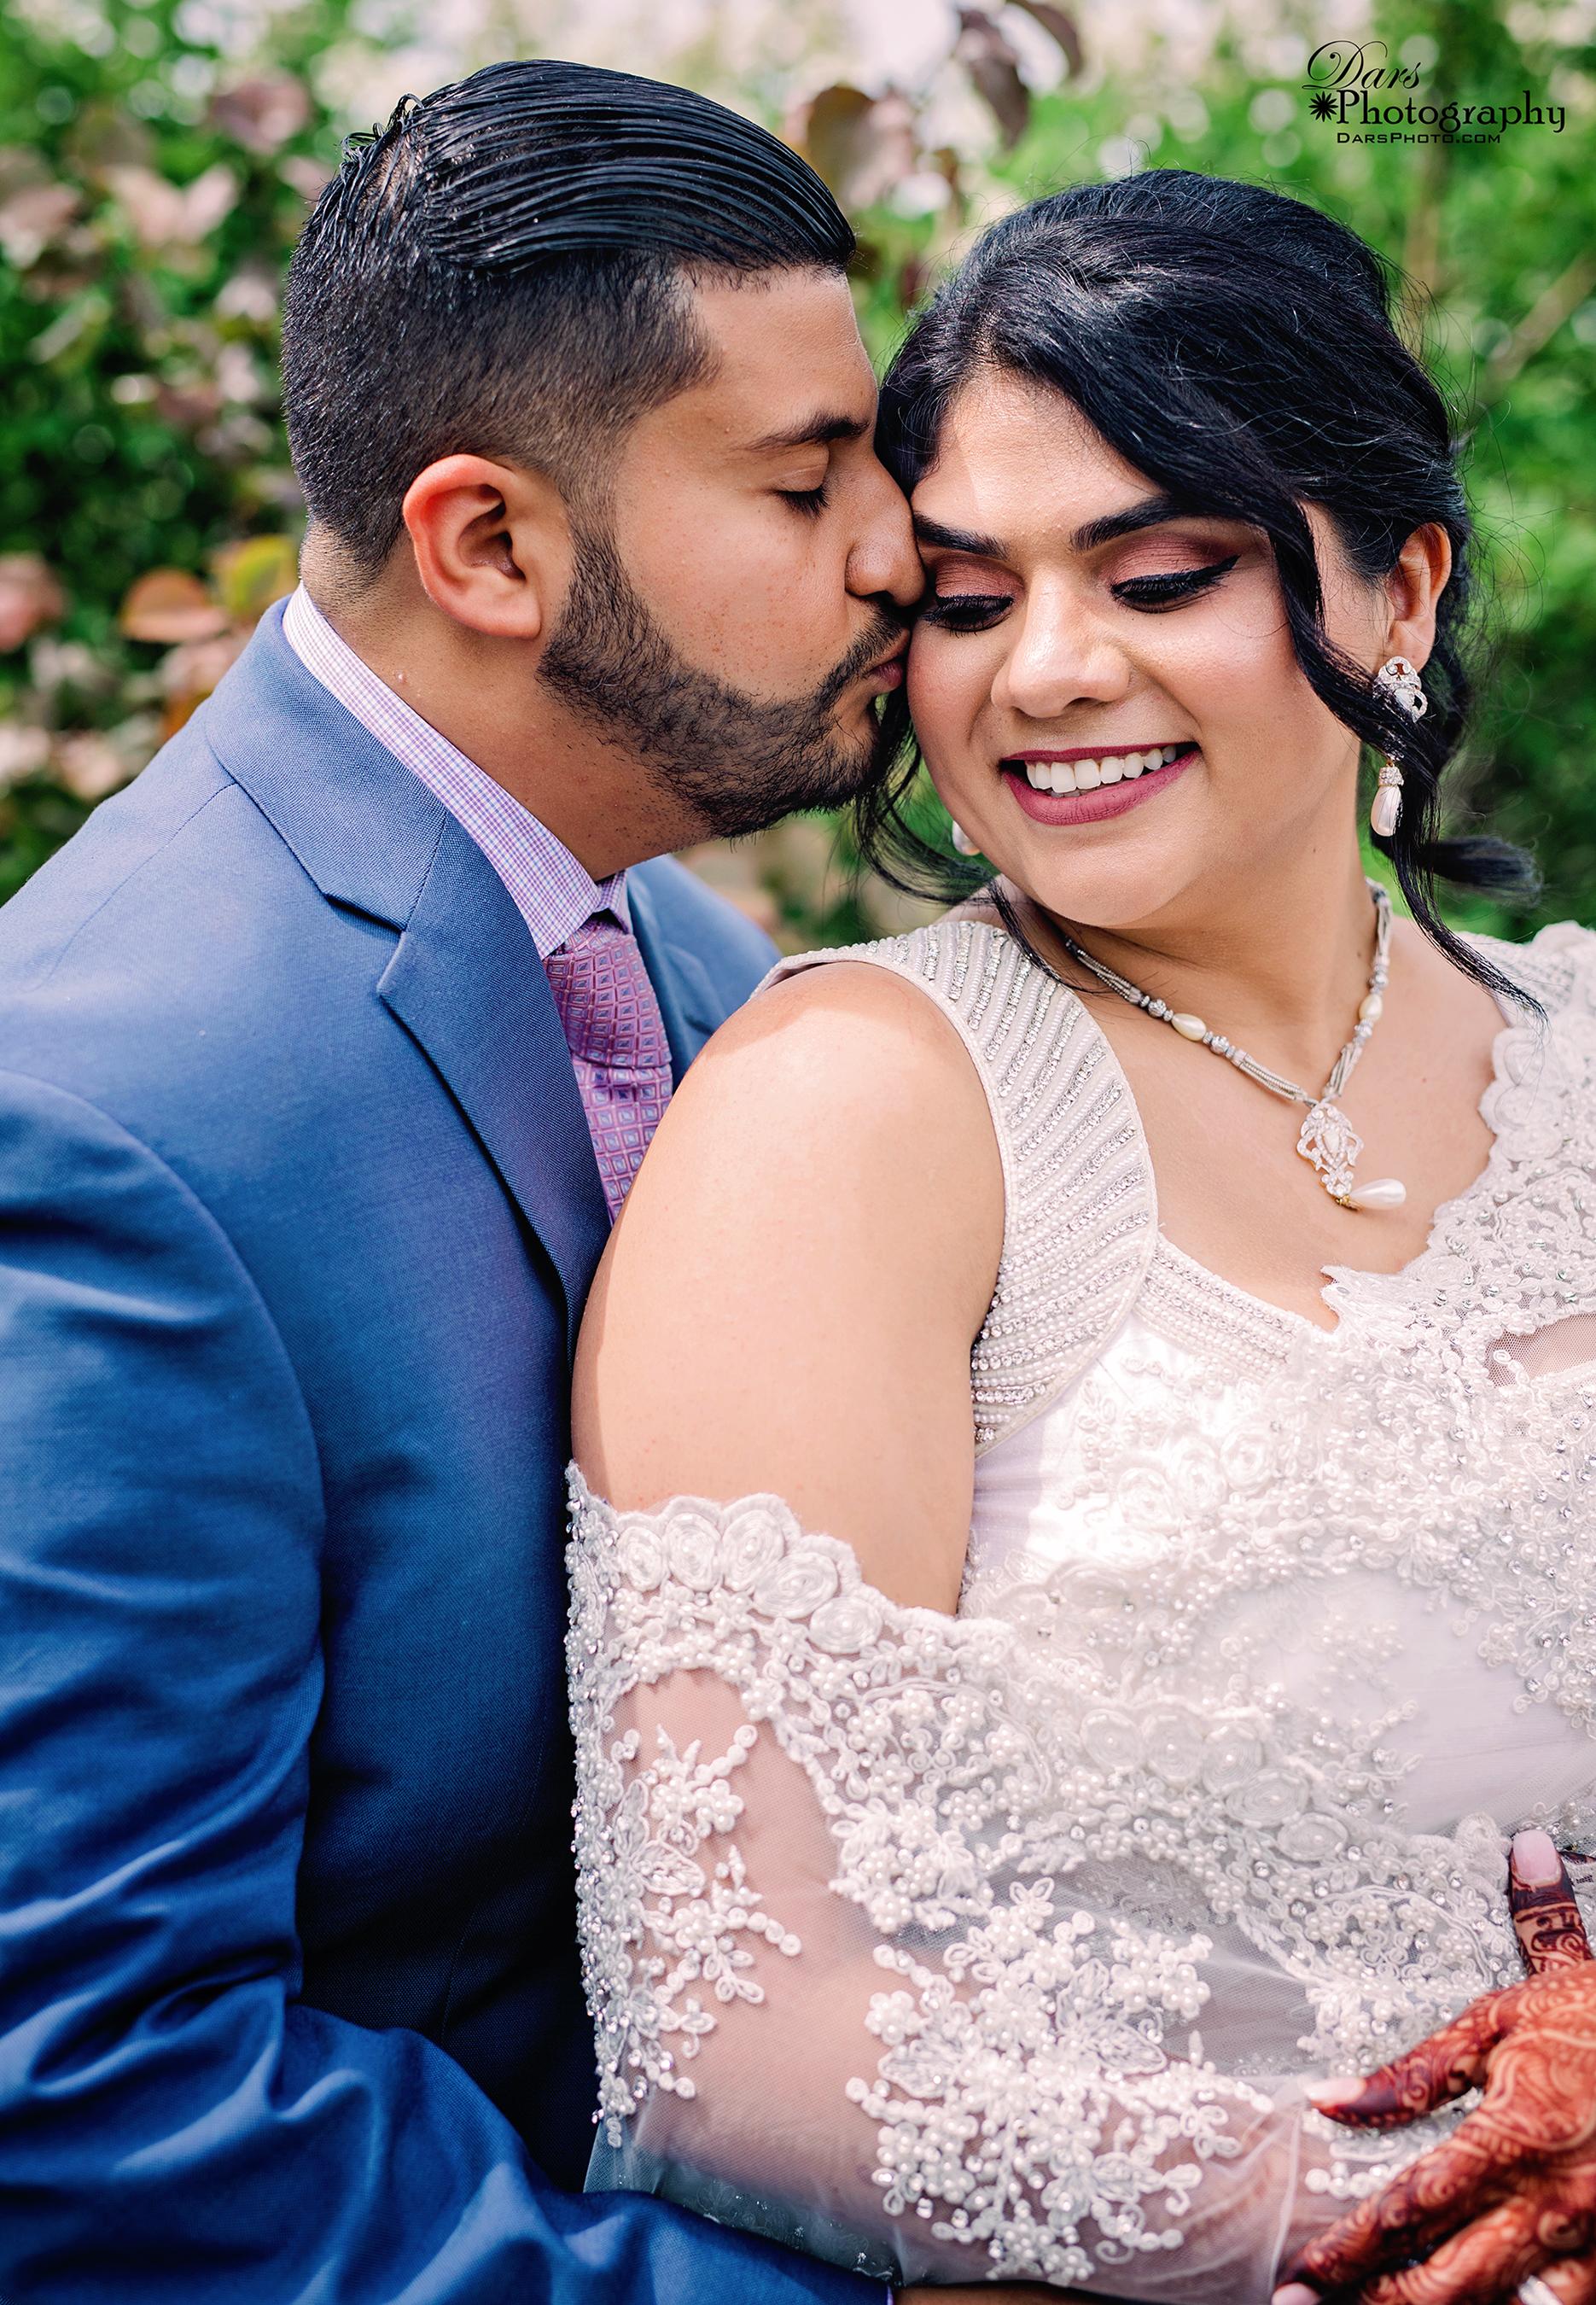 Pakistani Wedding (27) – DARS Photography